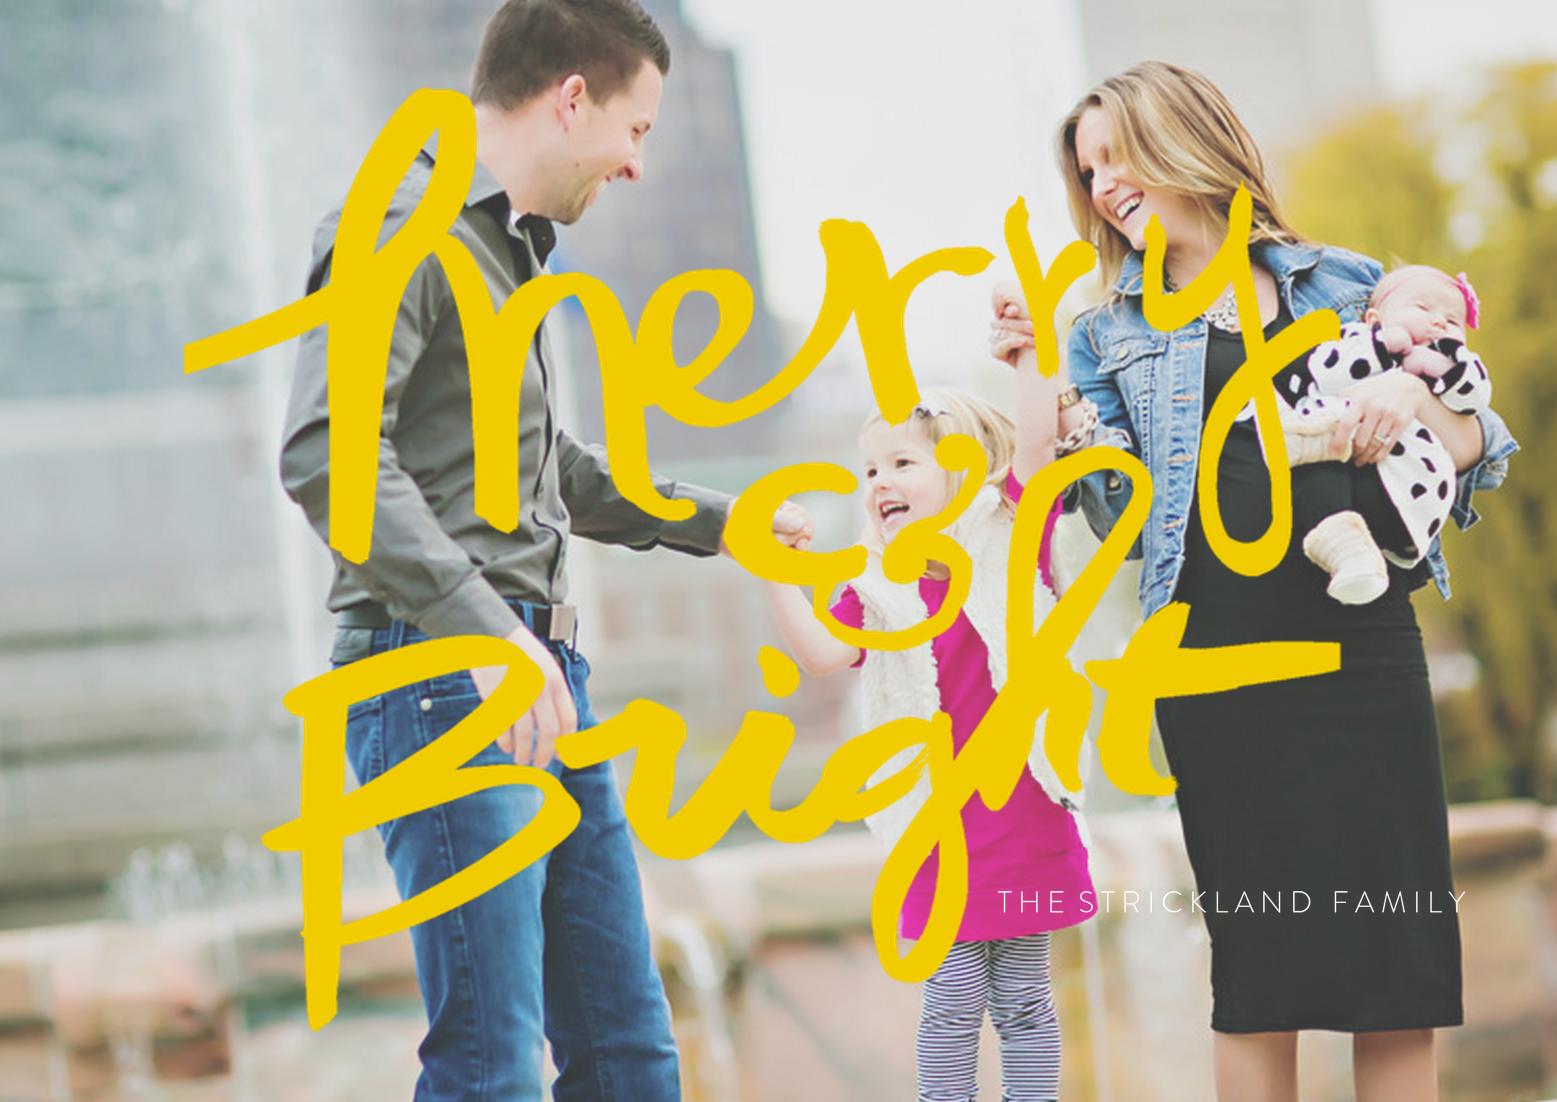 MERRY CHRISTMAS + HAPPY NEW YEAR | 2013